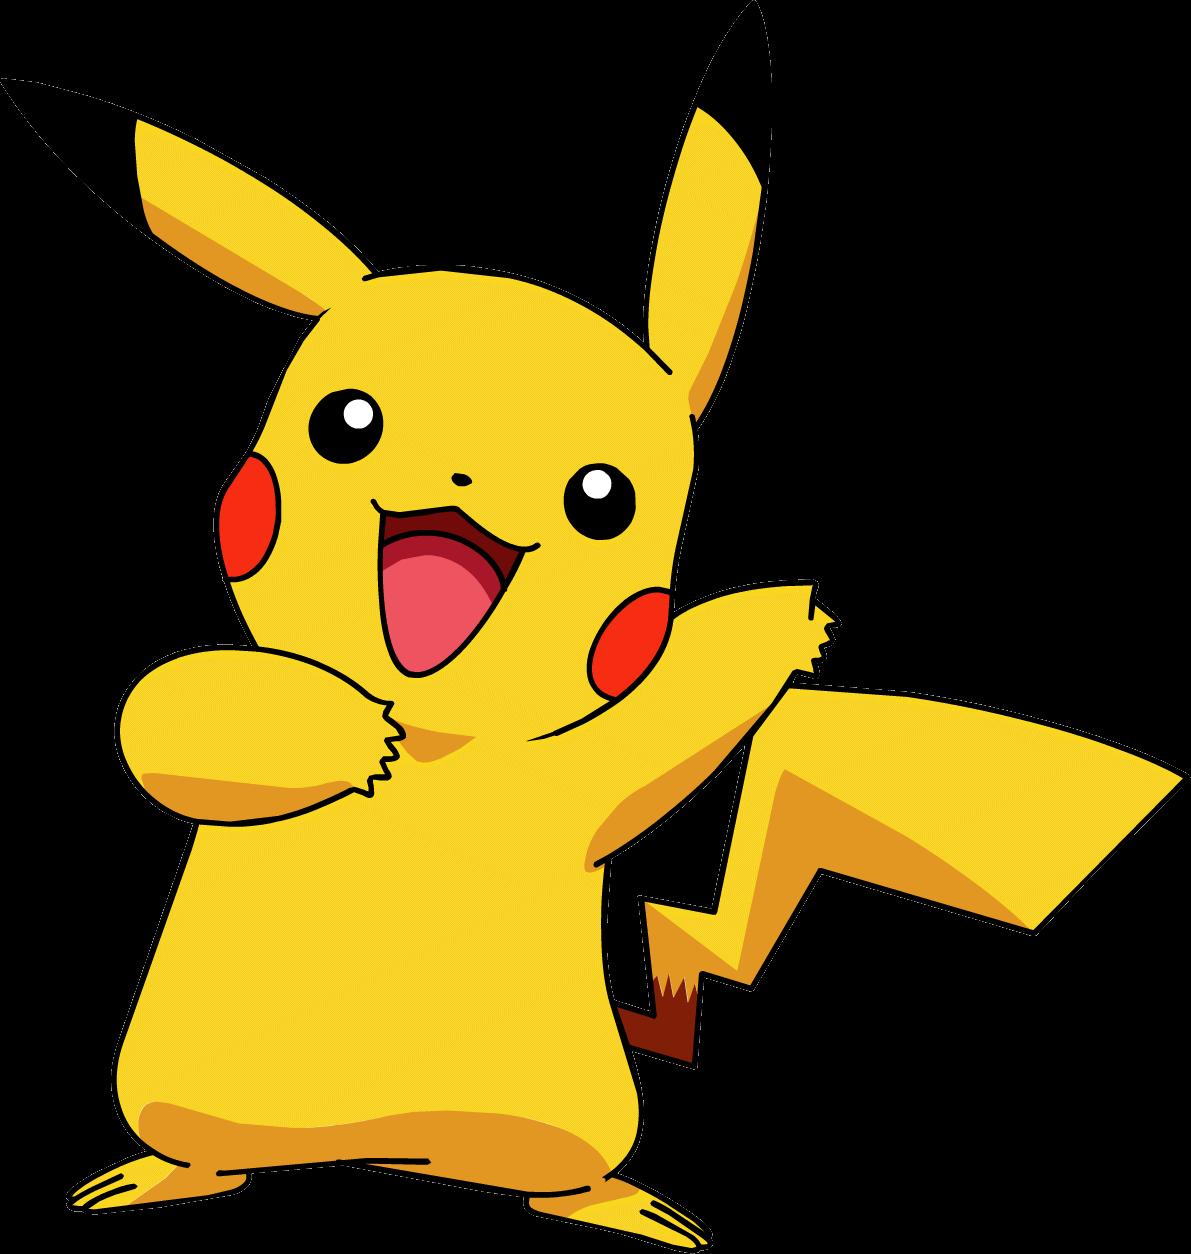 1191x1254 Pikachu Pokemon Transparent Png